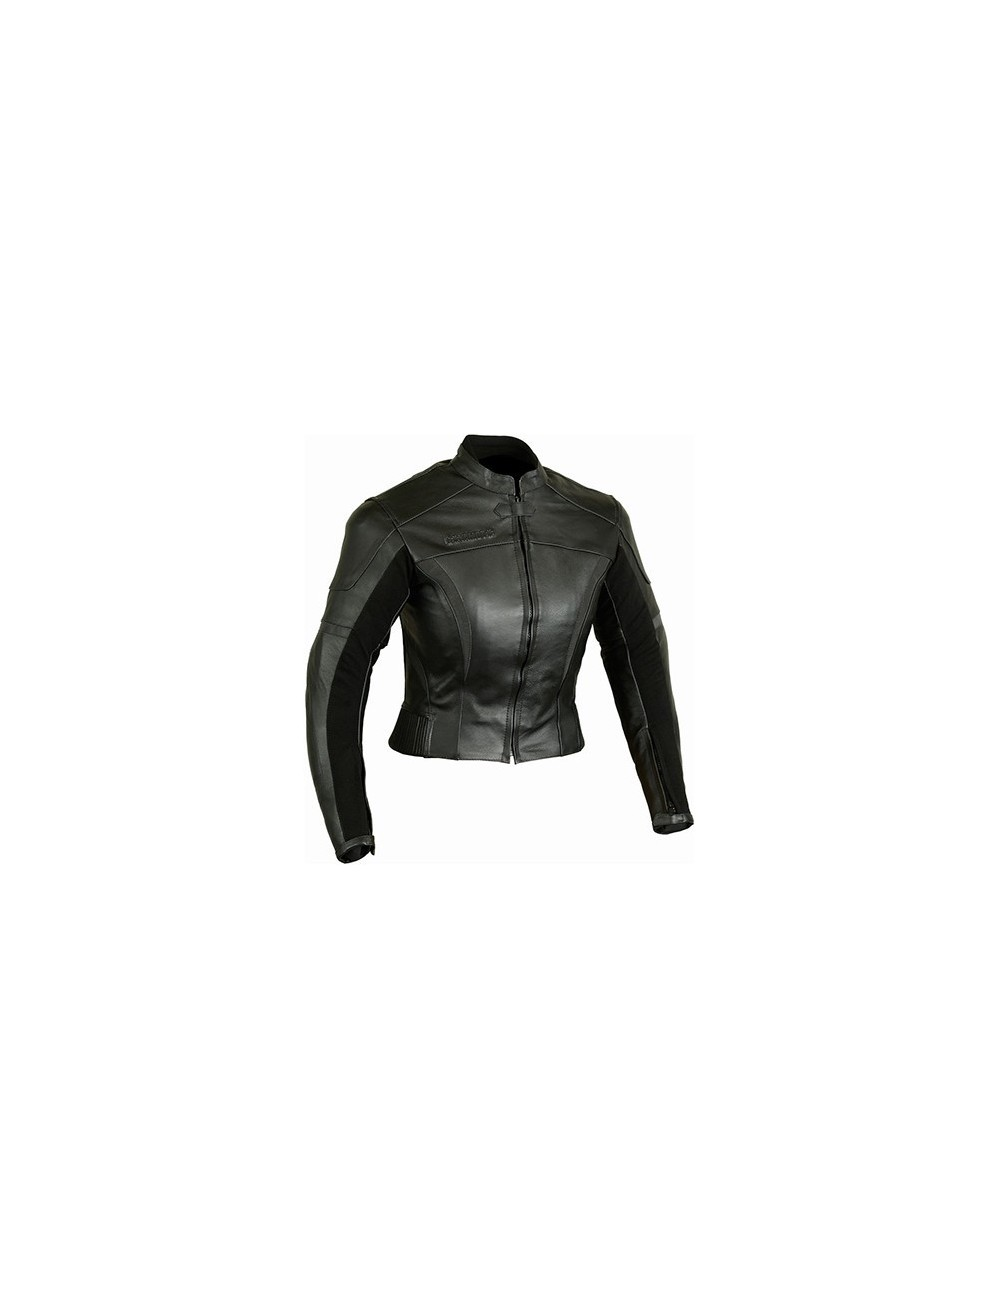 Blouson moto cuir - Blouson moto femme cuir noir coques protection